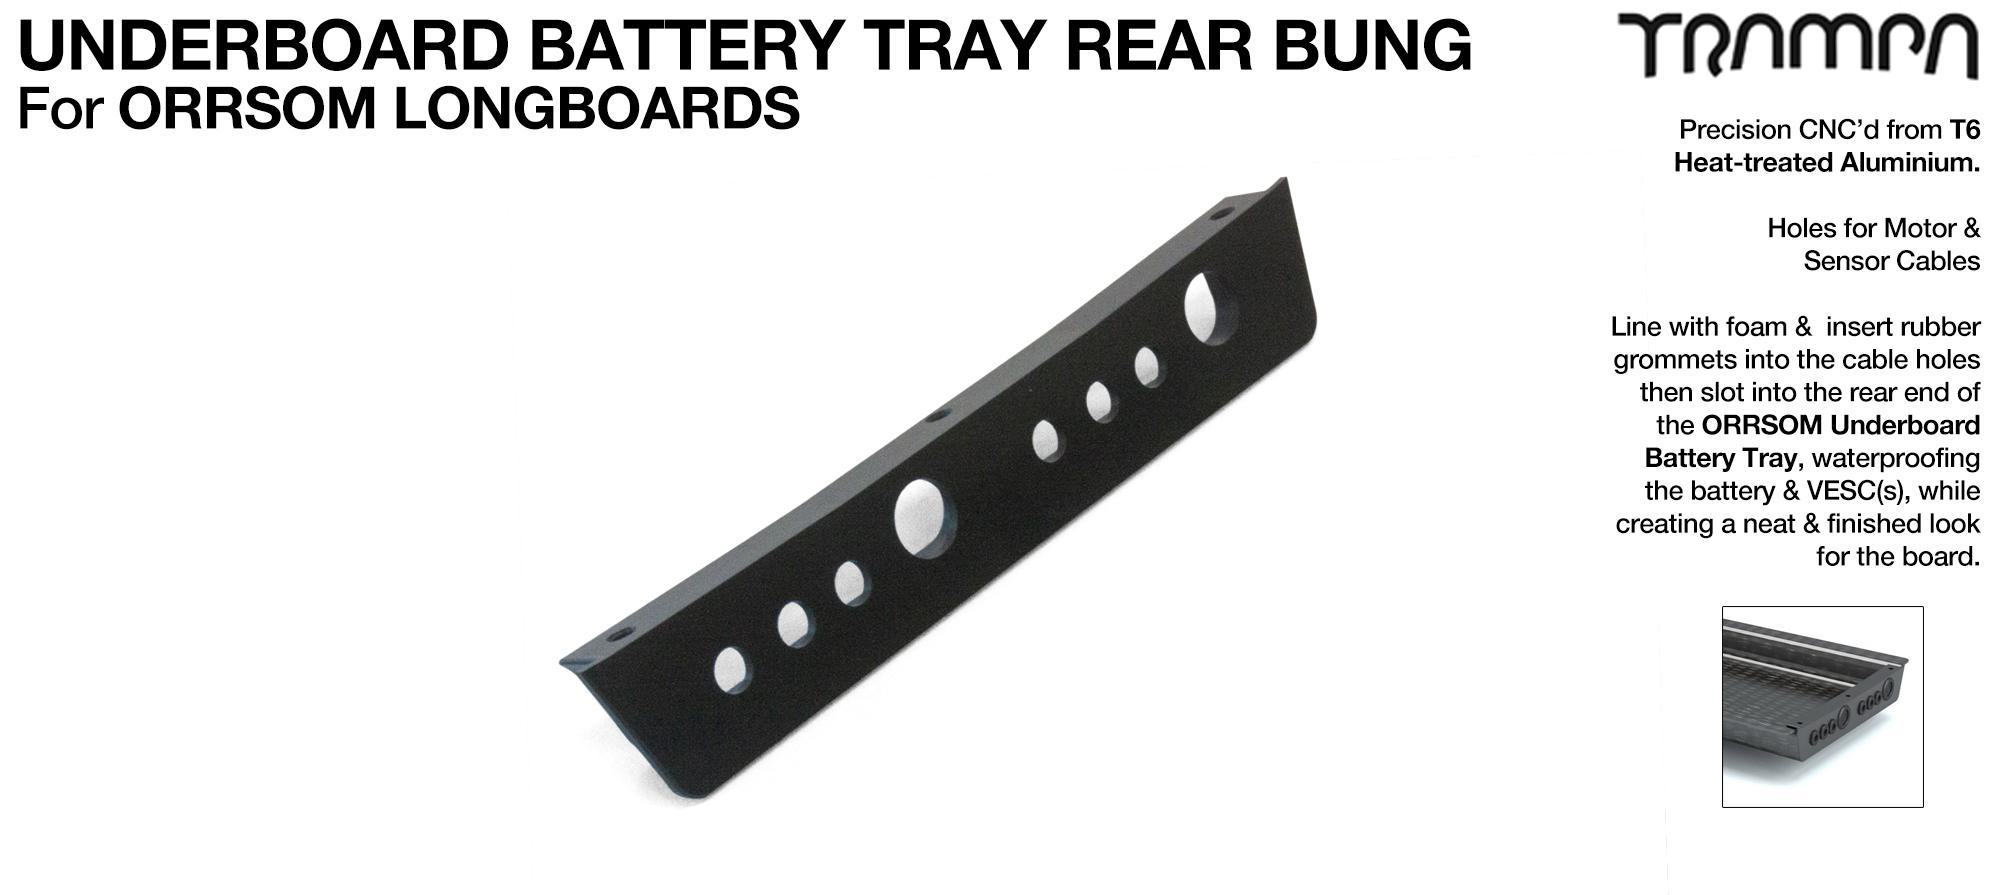 Underboard Battery Tray Rear end T6 Bung